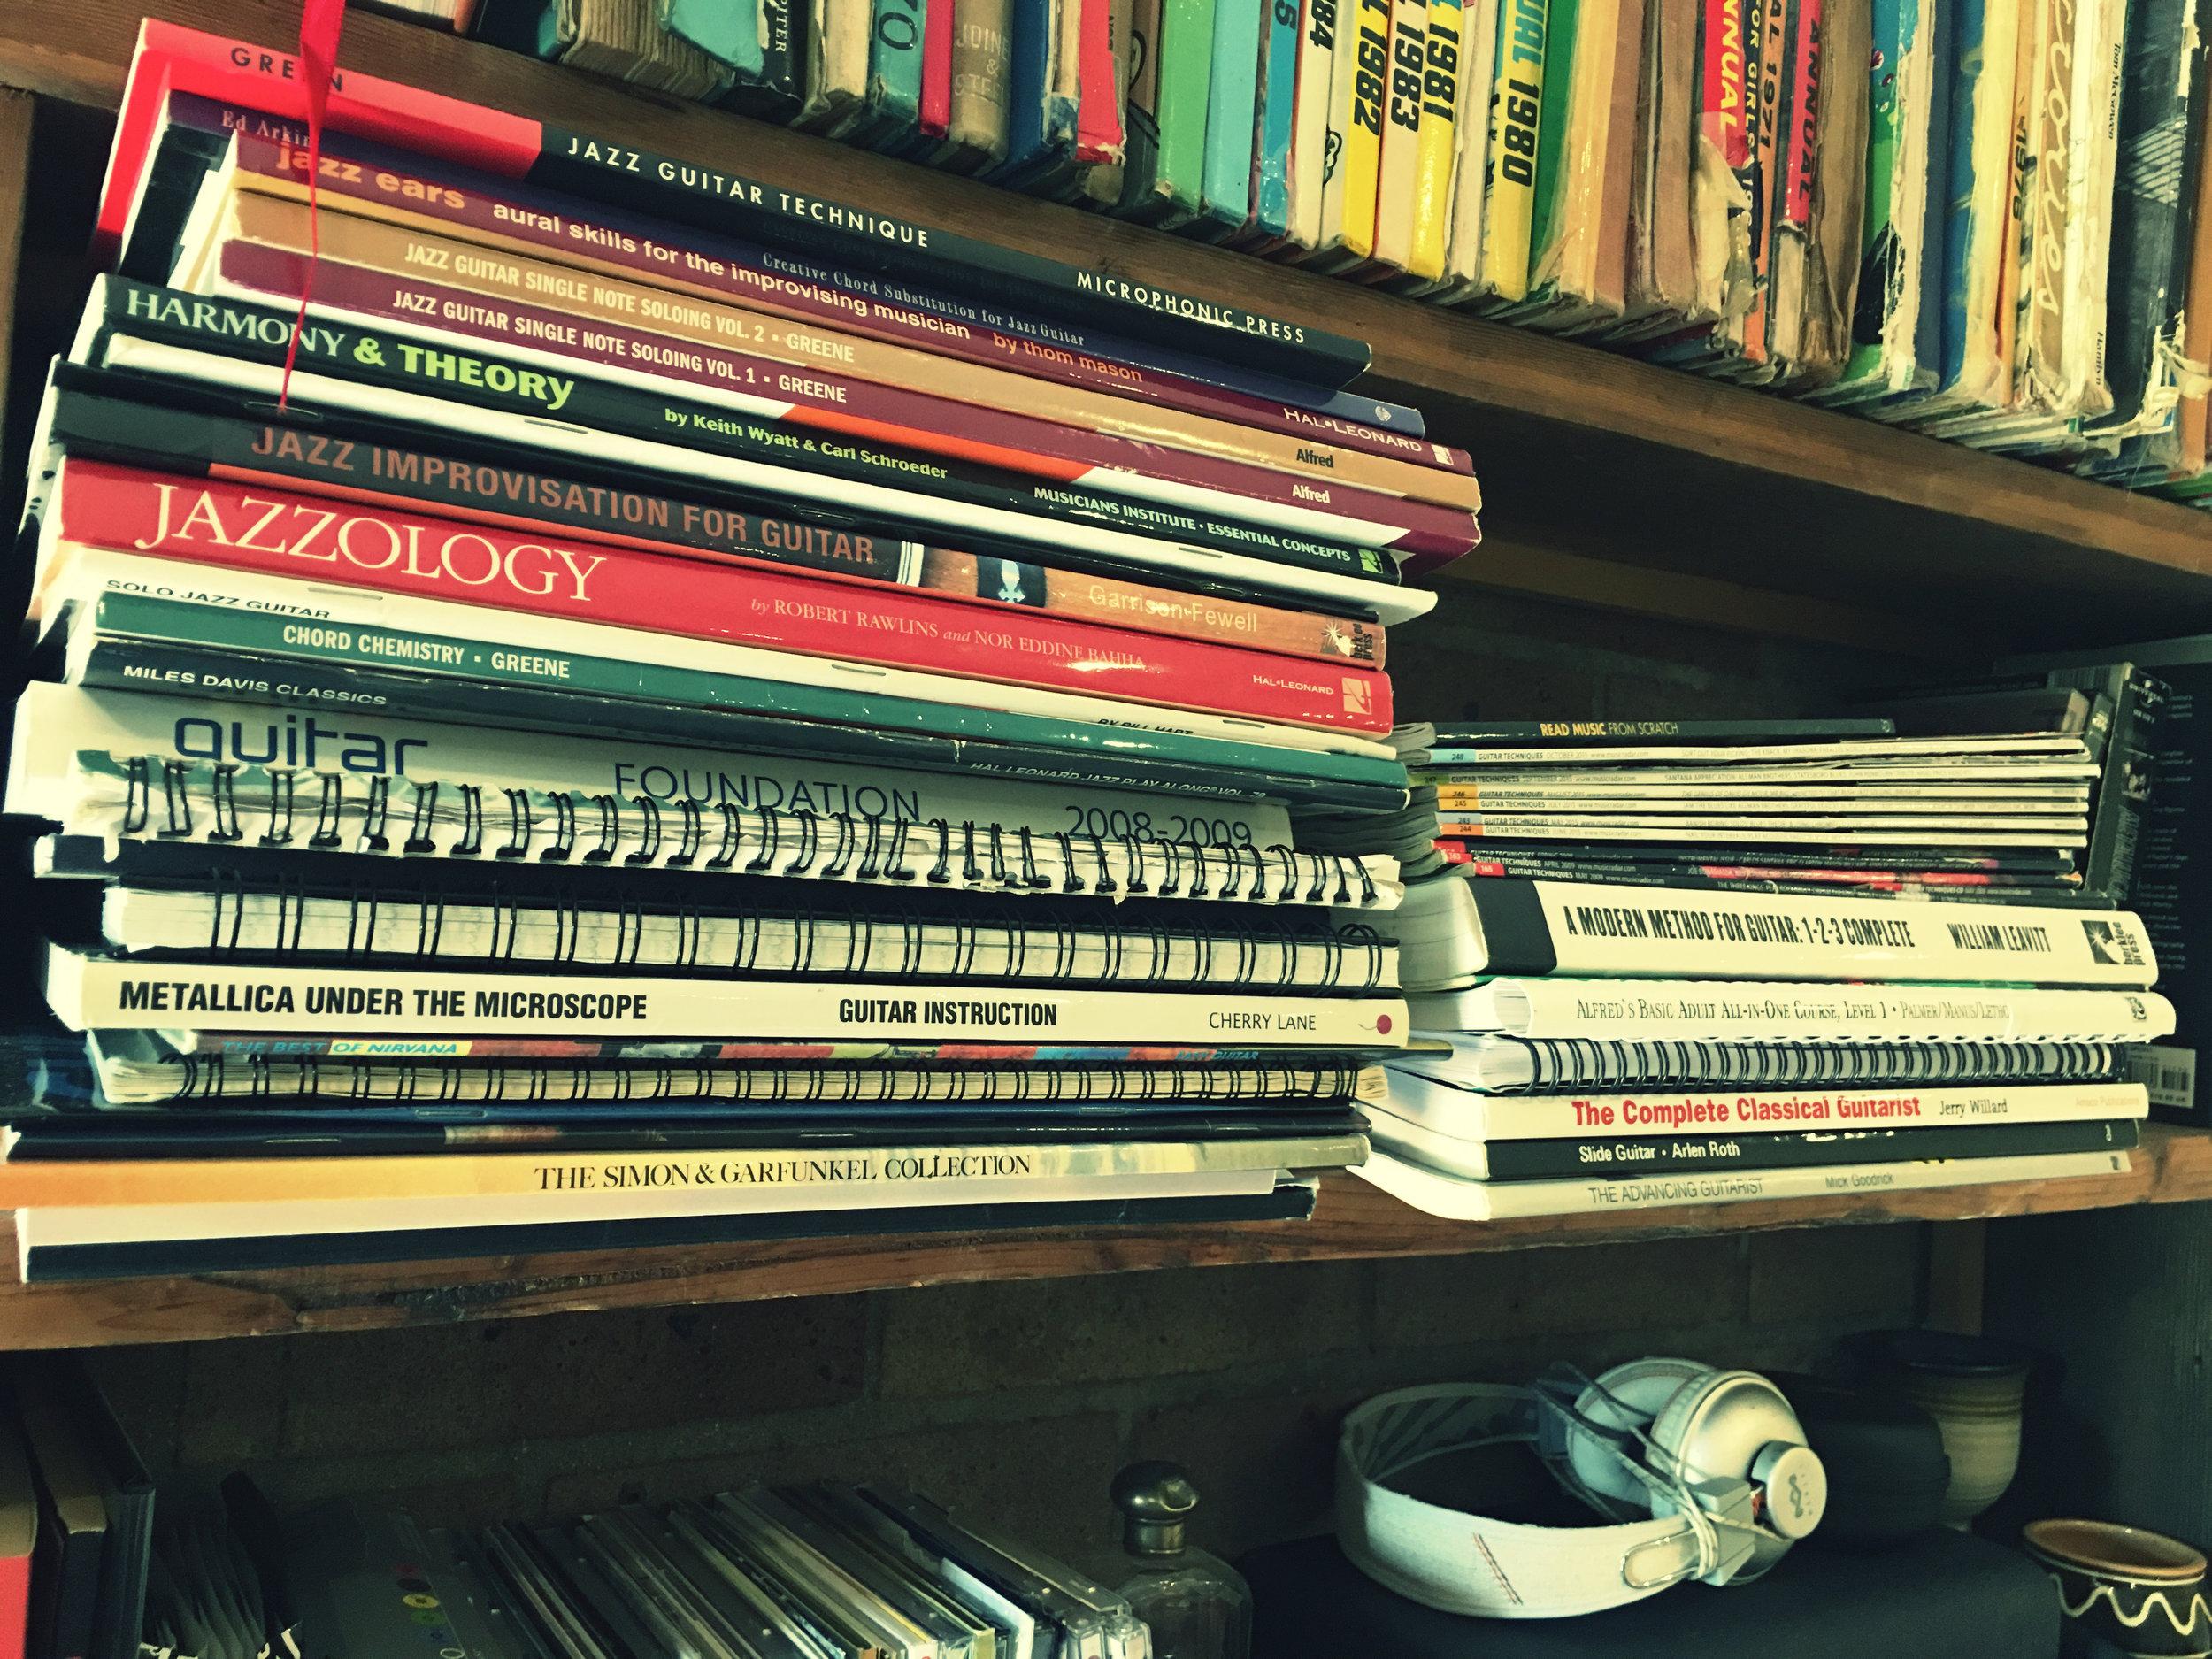 Guitar books!